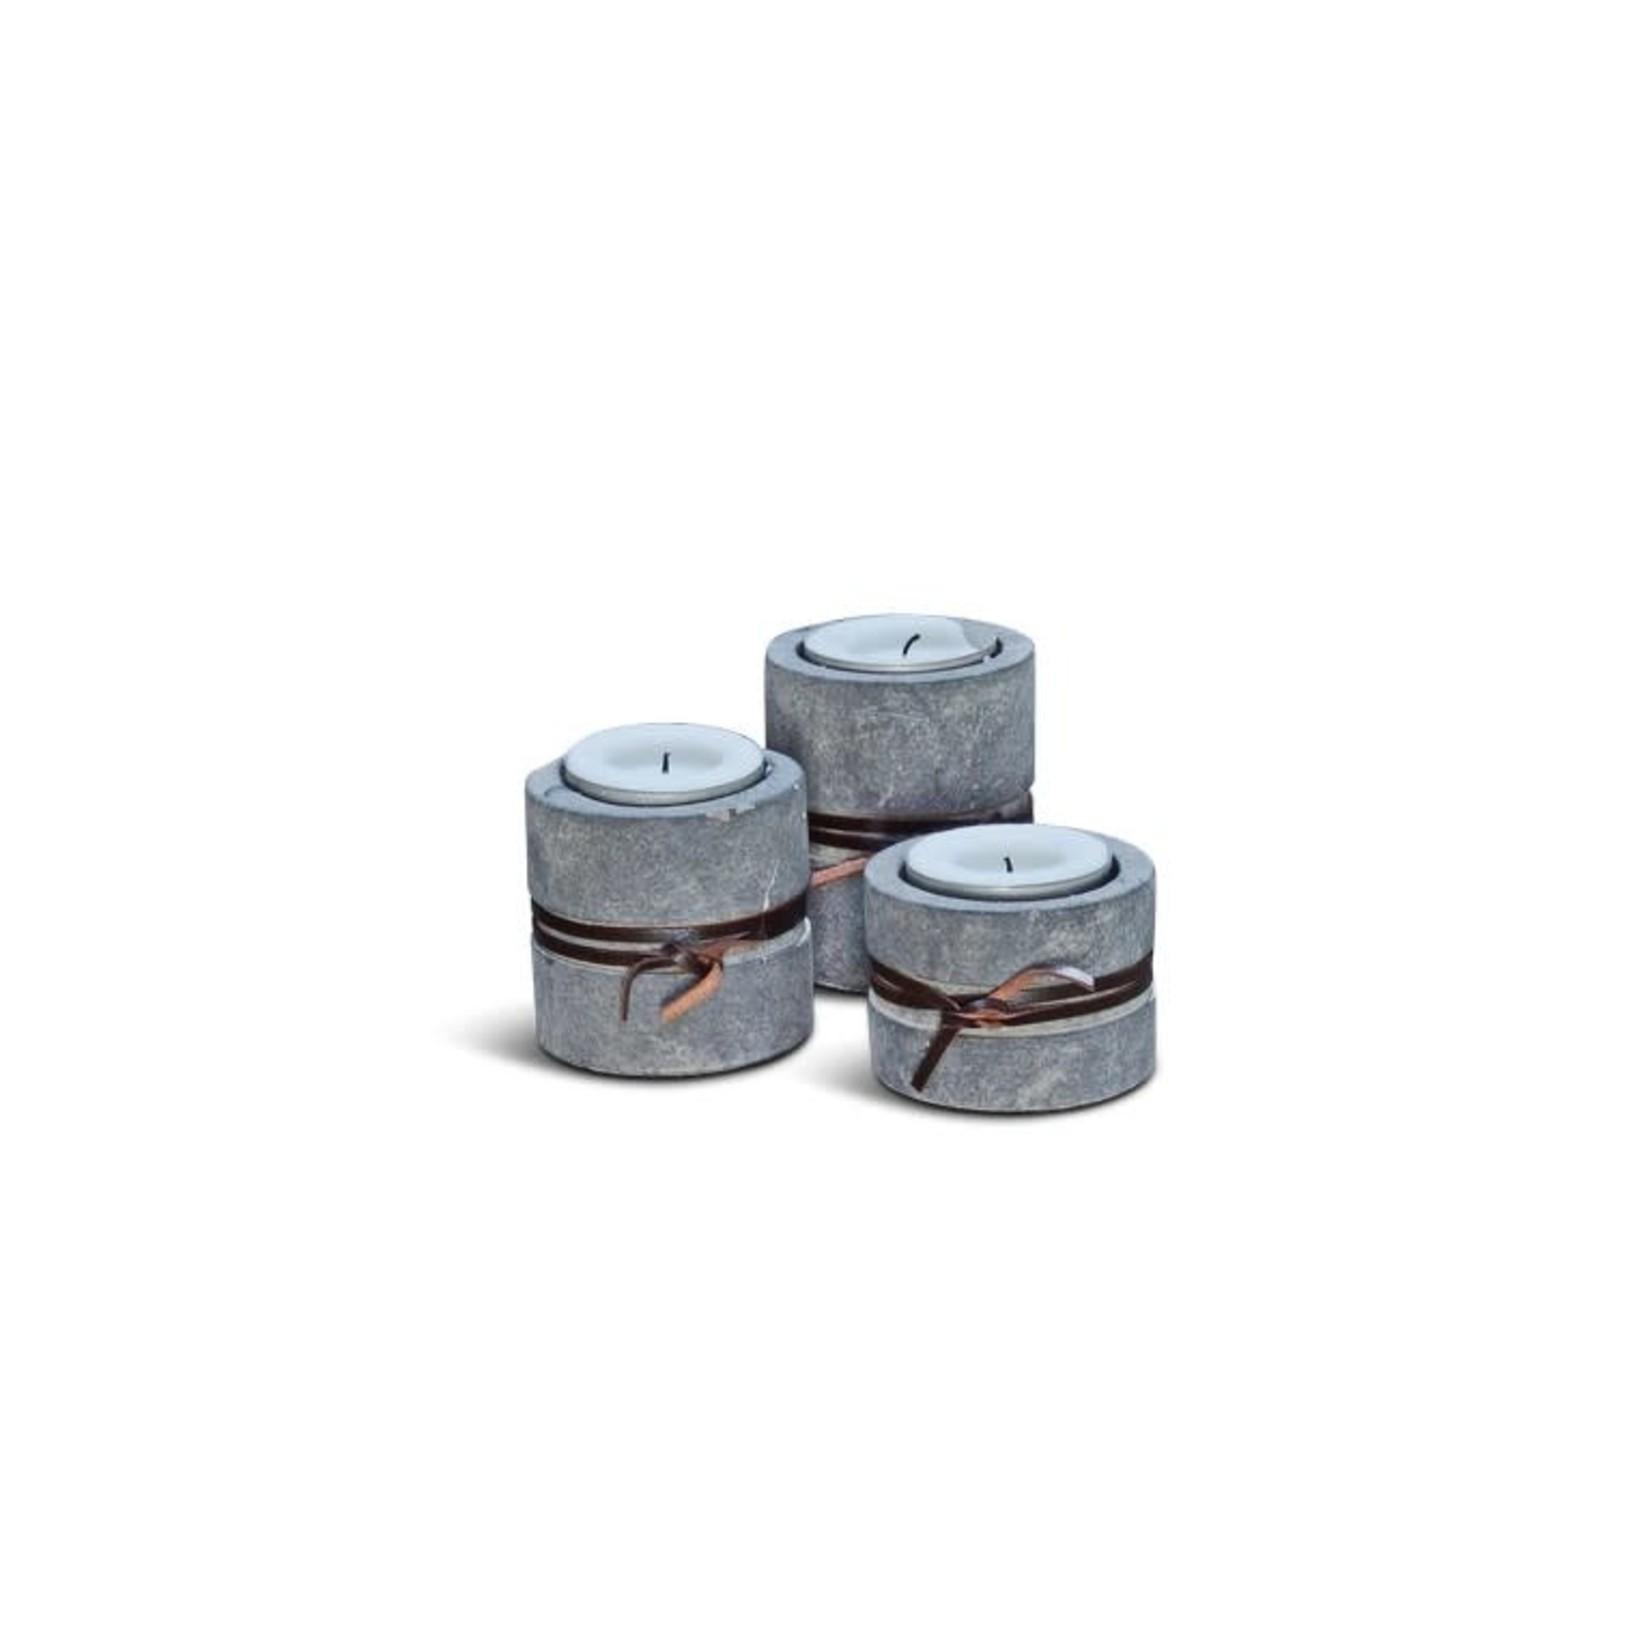 Brynxz Brynxz | Candleholder small (pst)